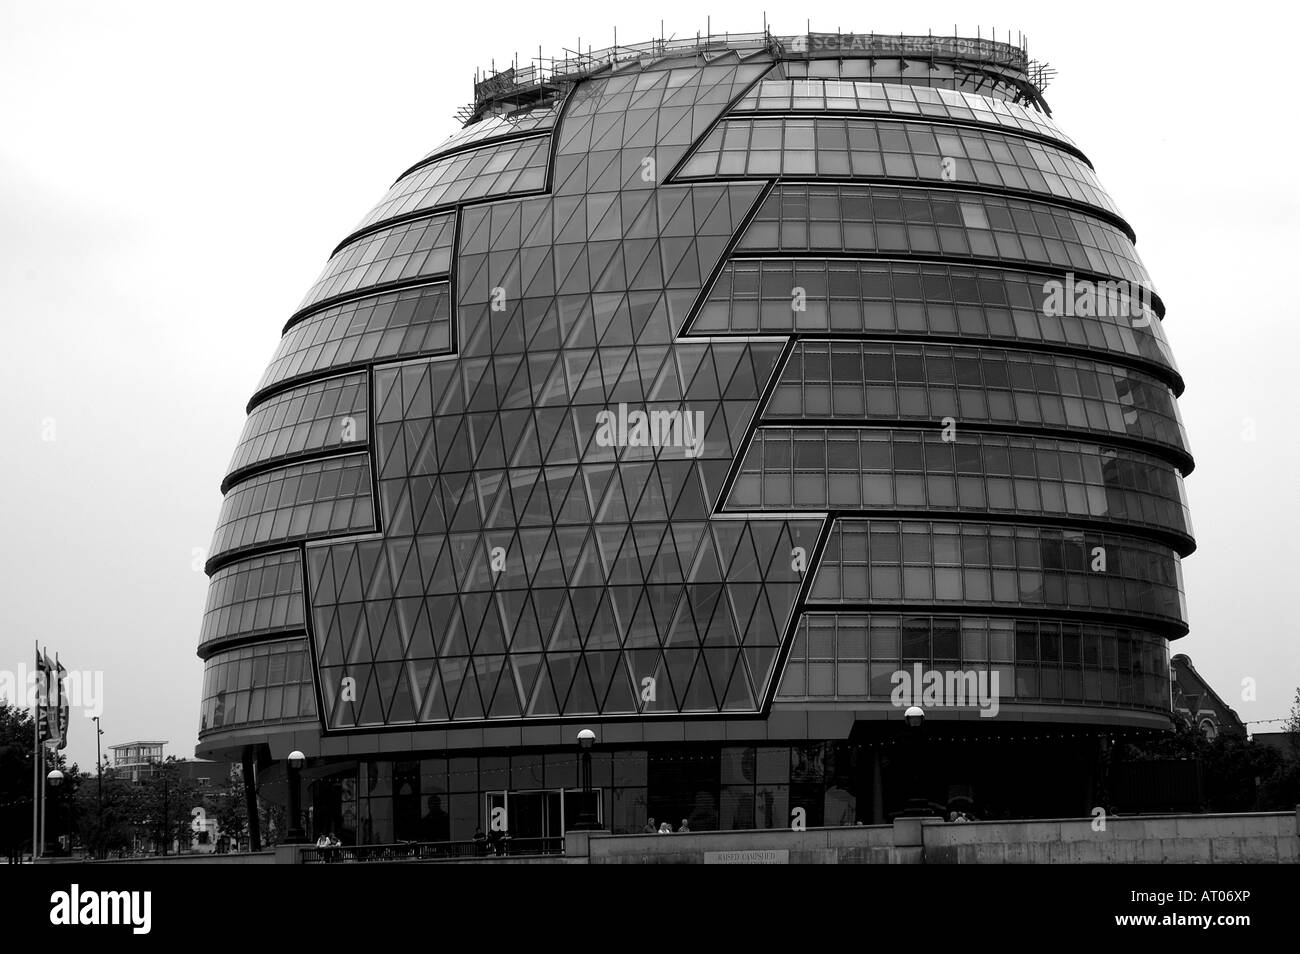 The City Hall London UK - Stock Image